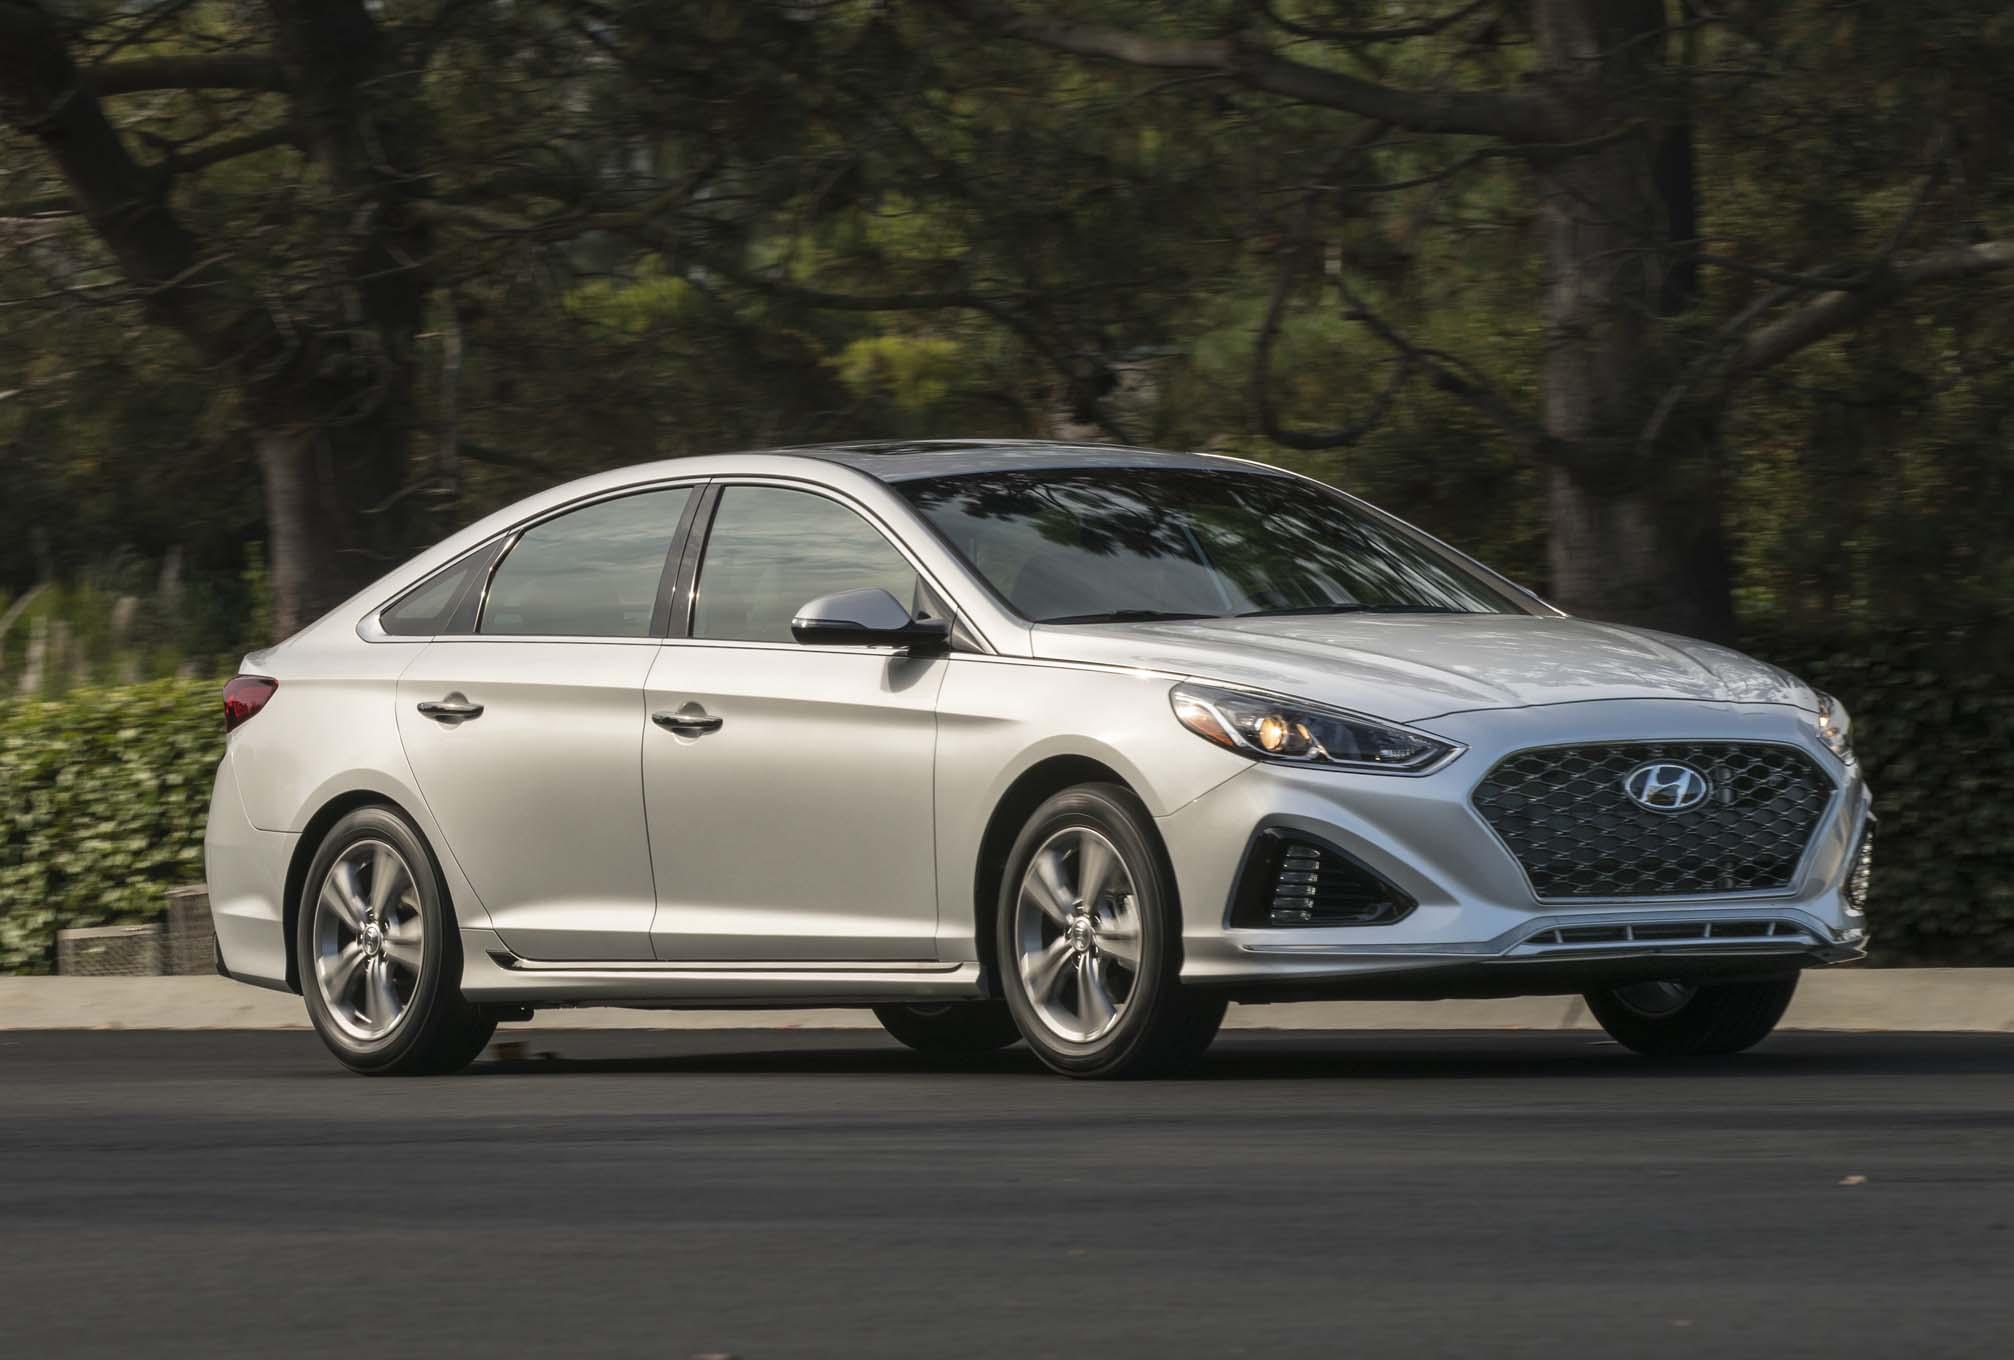 massachusetts htm inventory new or sedan norwood sonata lease hyundai buy attleboro north